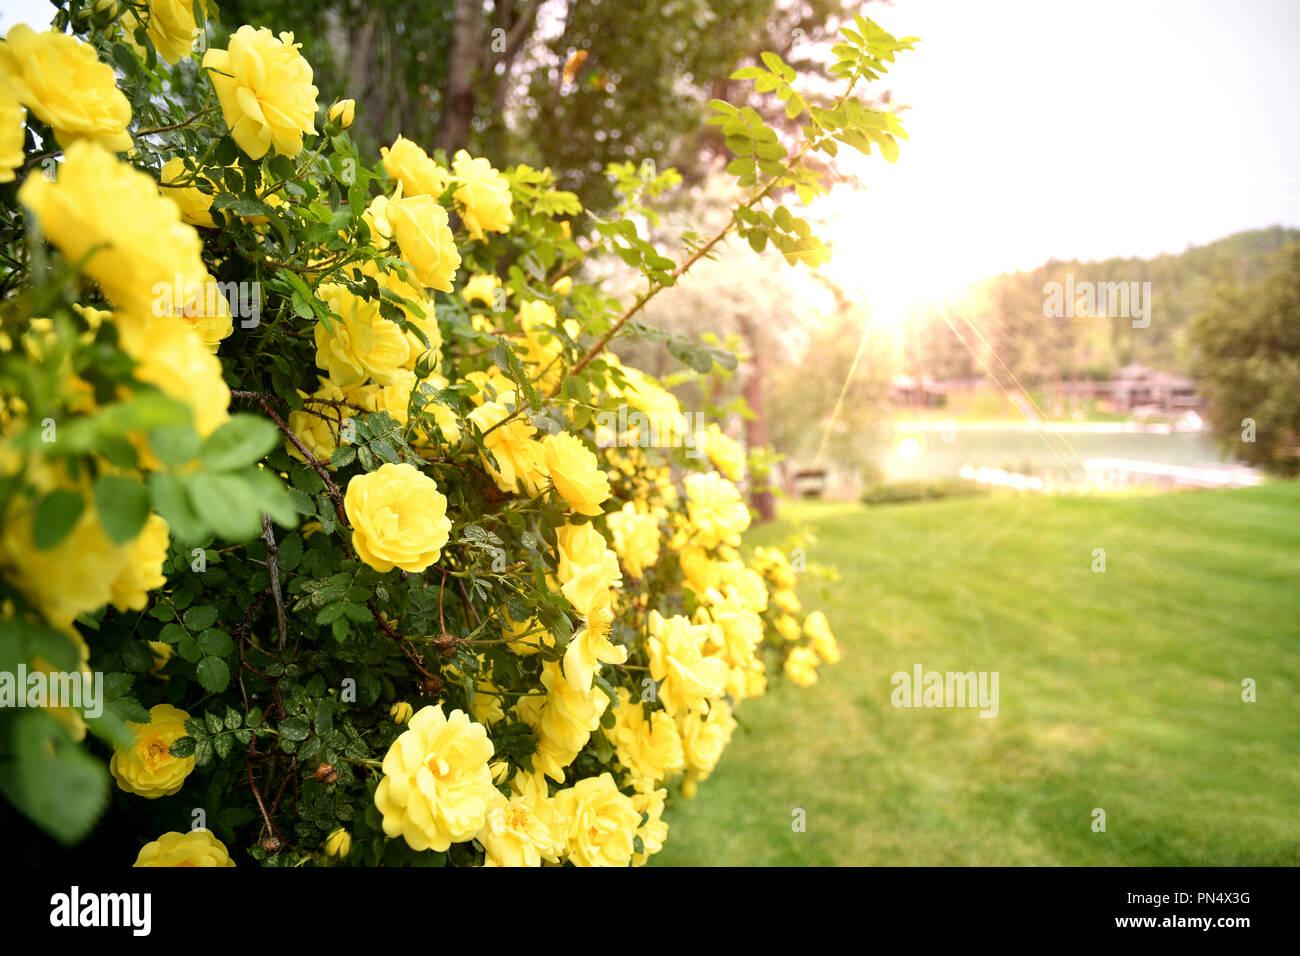 Bush of yellow roses basking in the morning sunlight Stock Photo